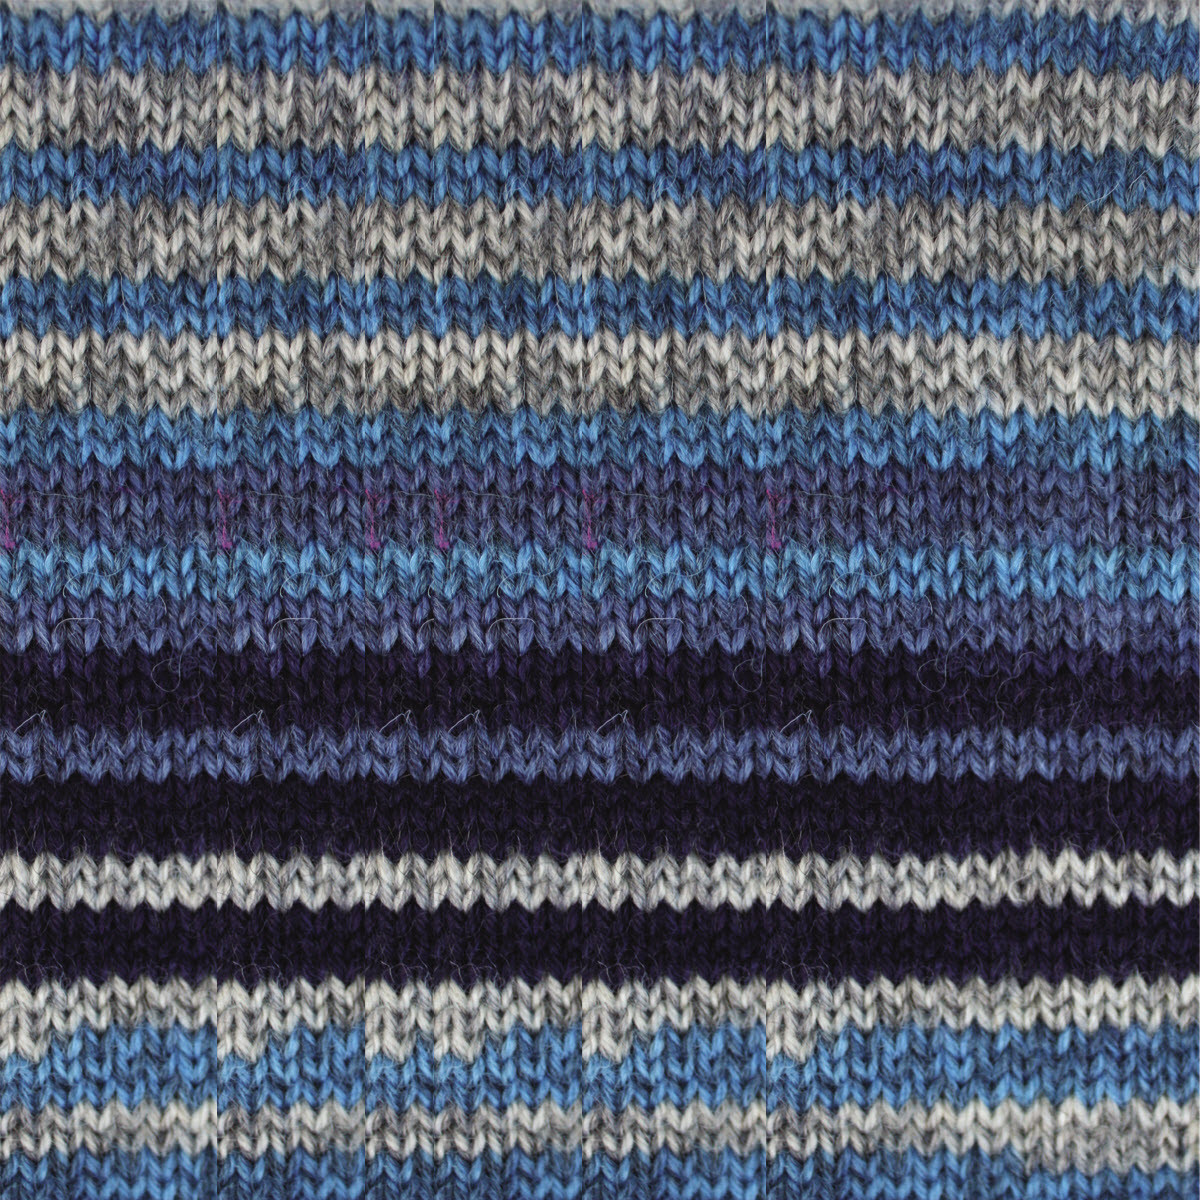 Patons Sing'n The Blues Kroy Socks Yarn (1 - Super Fine